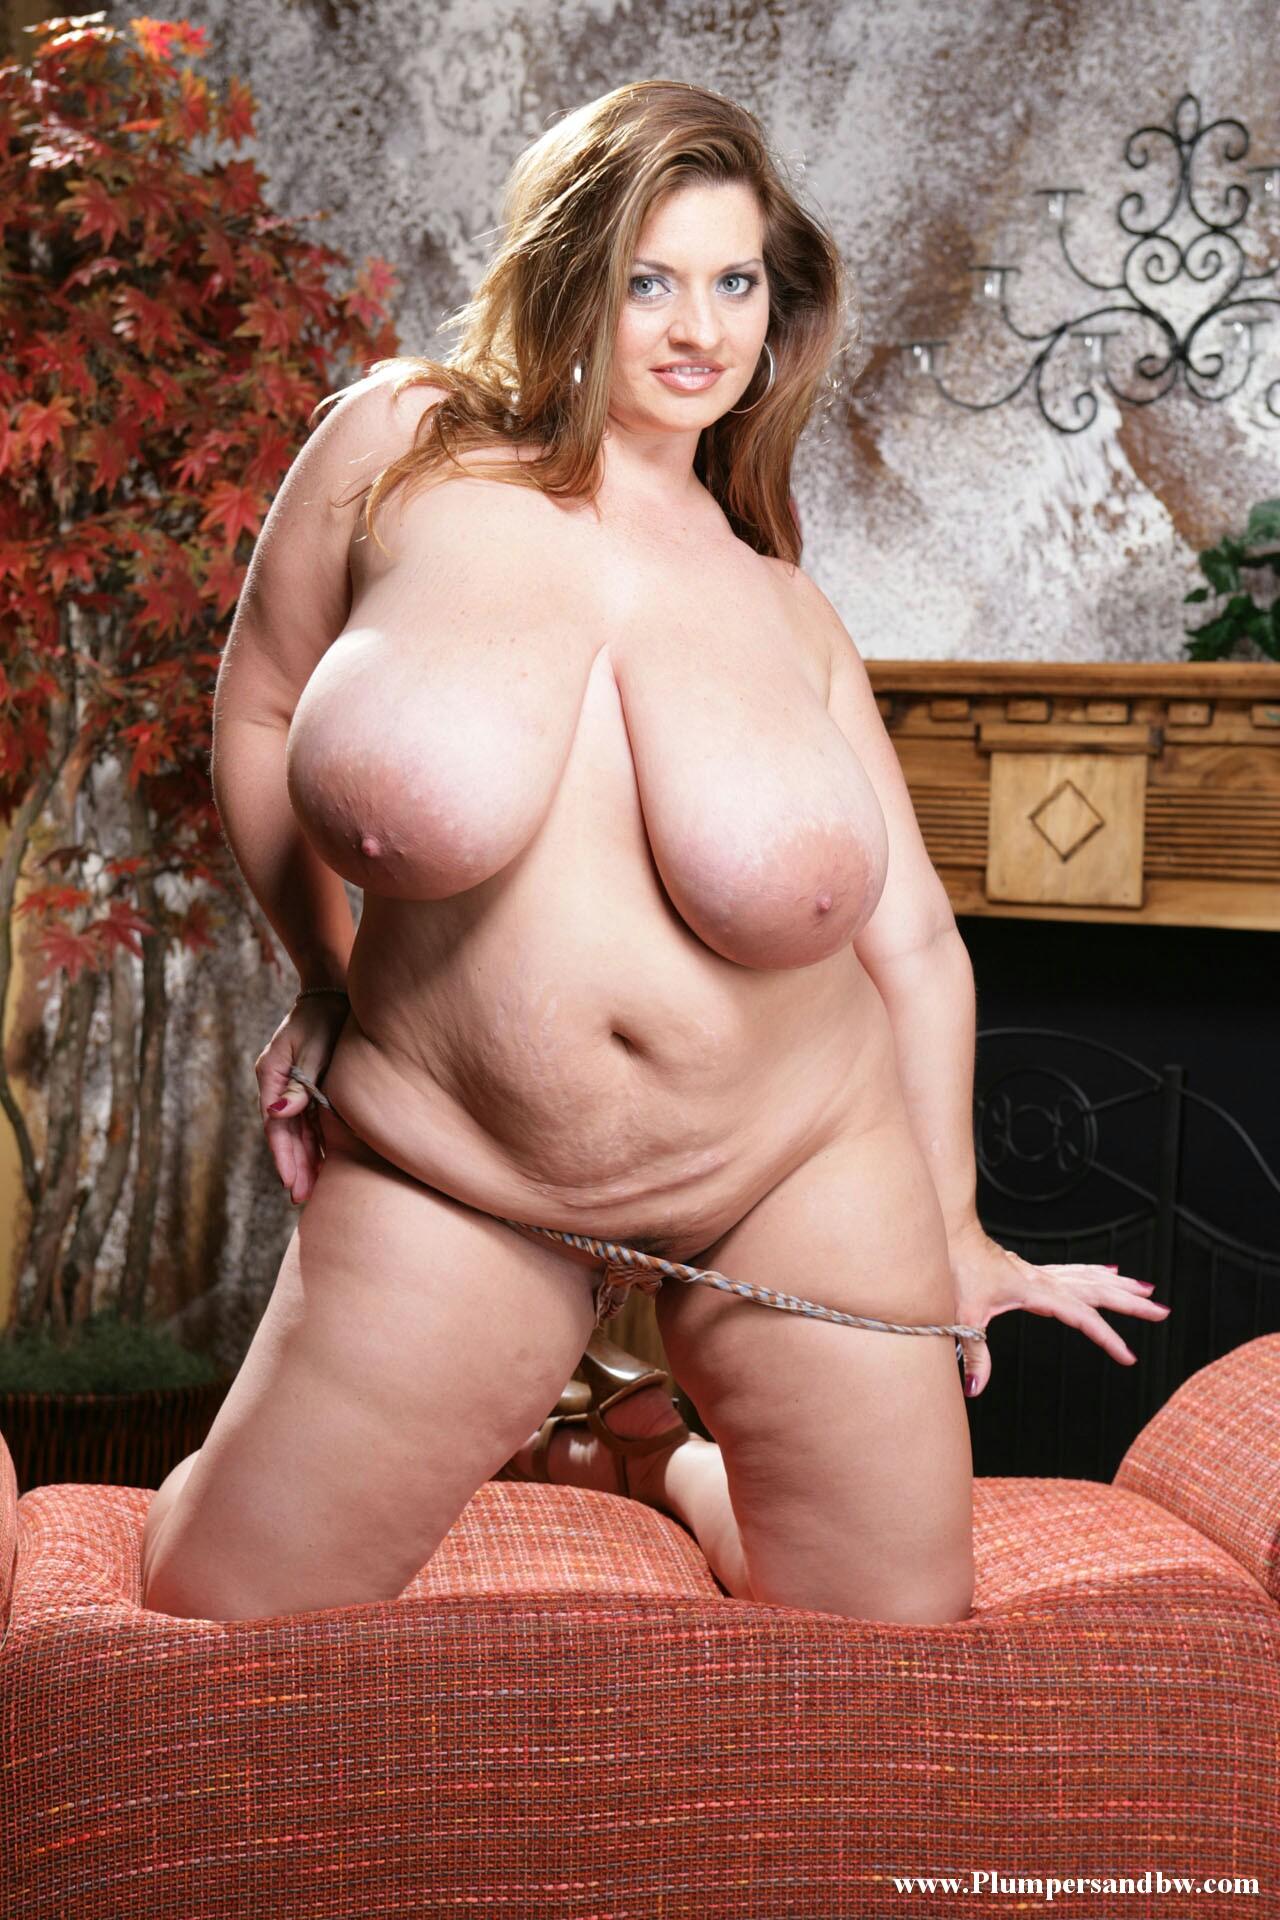 free nude girl vids